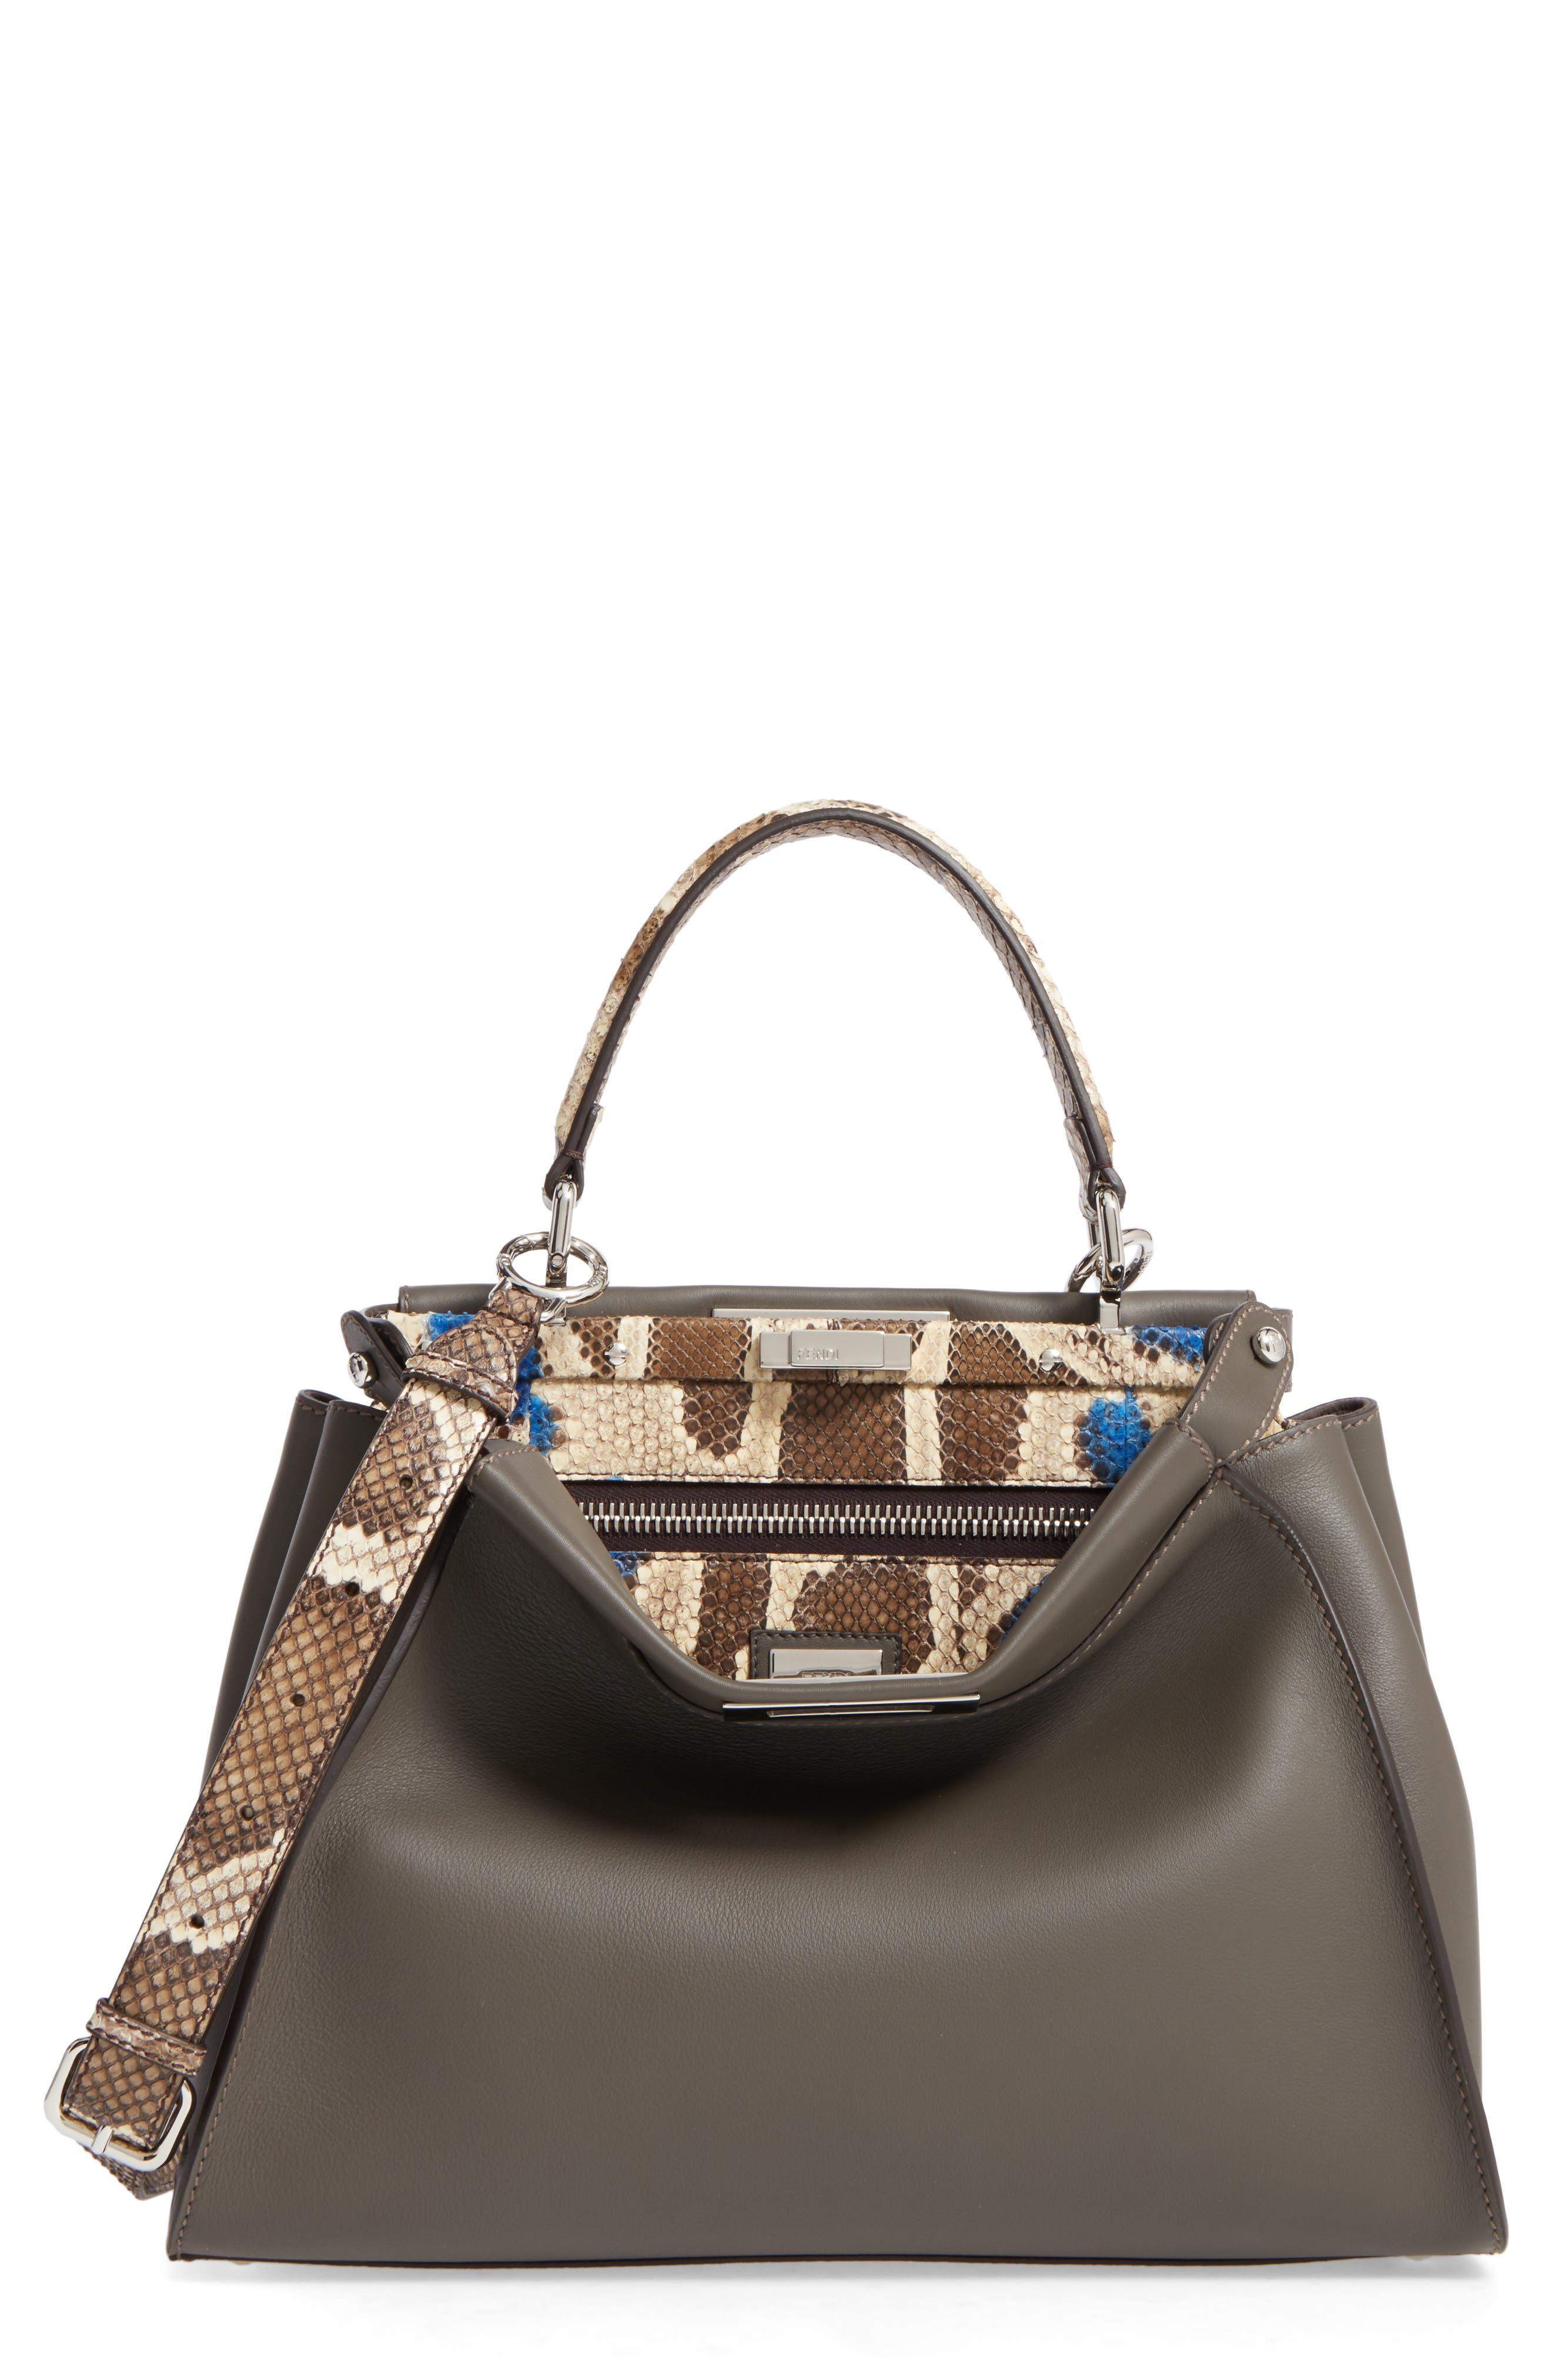 Main Image - Fendi Peekaboo Calfskin Leather & Genuine Python Satchel